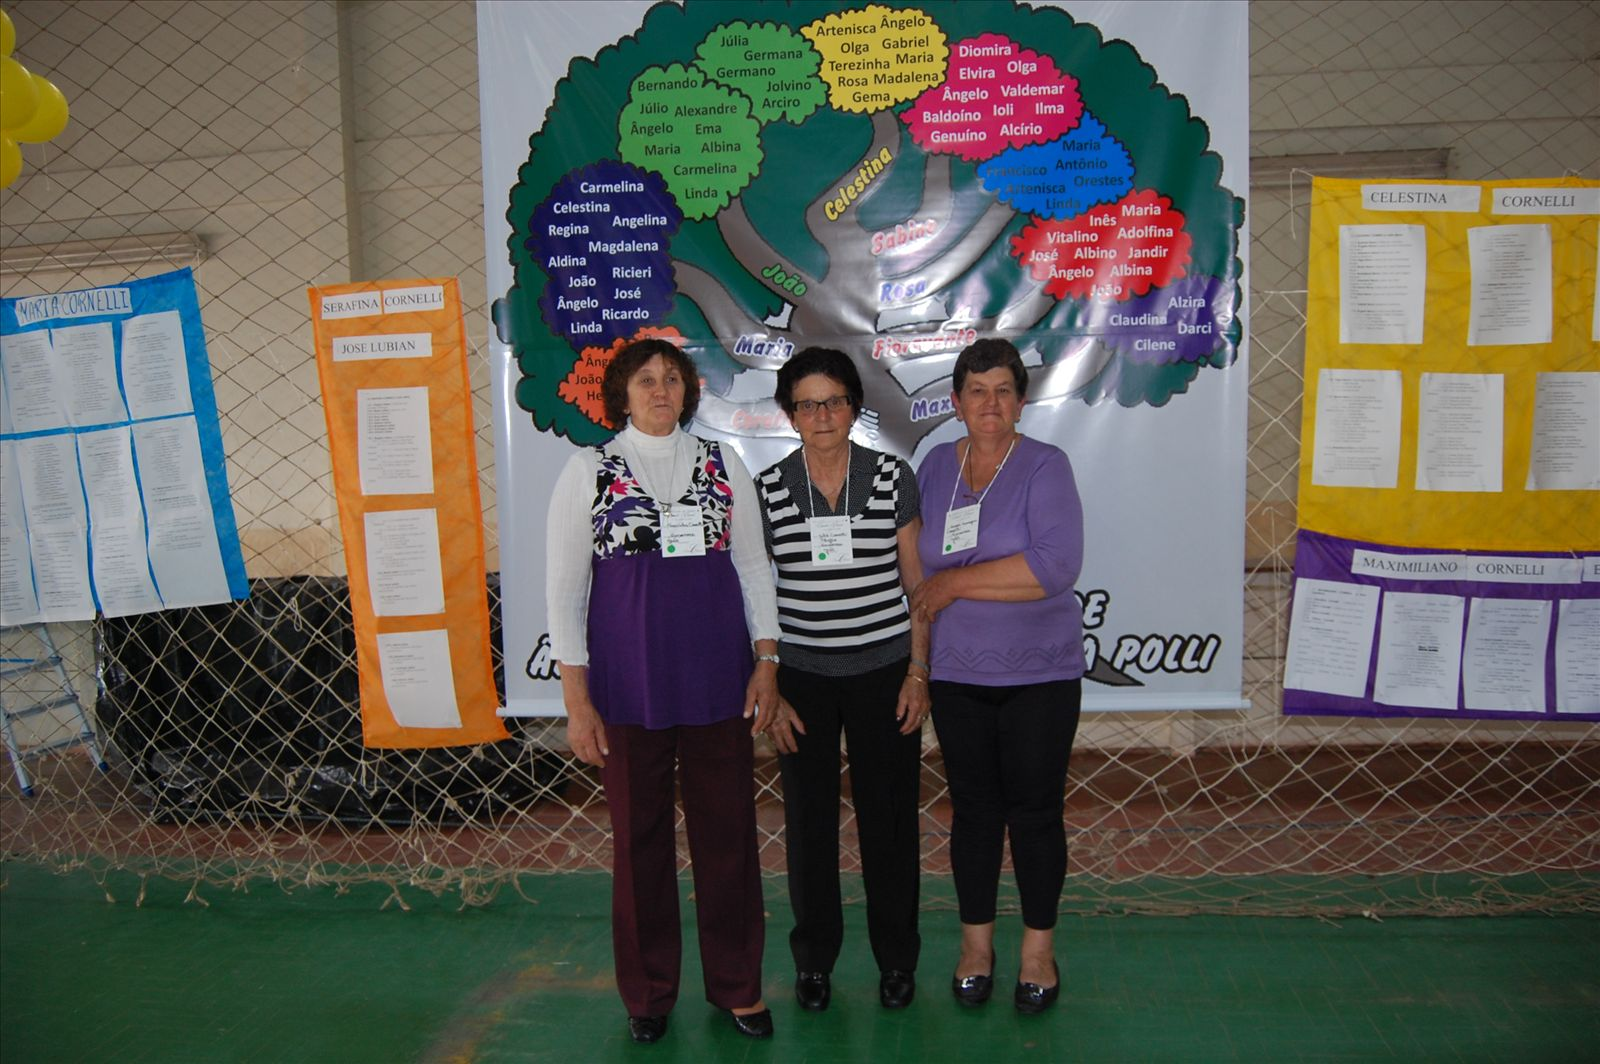 2º Encontro Família Cornelli - 11.10.2009 (204)_0